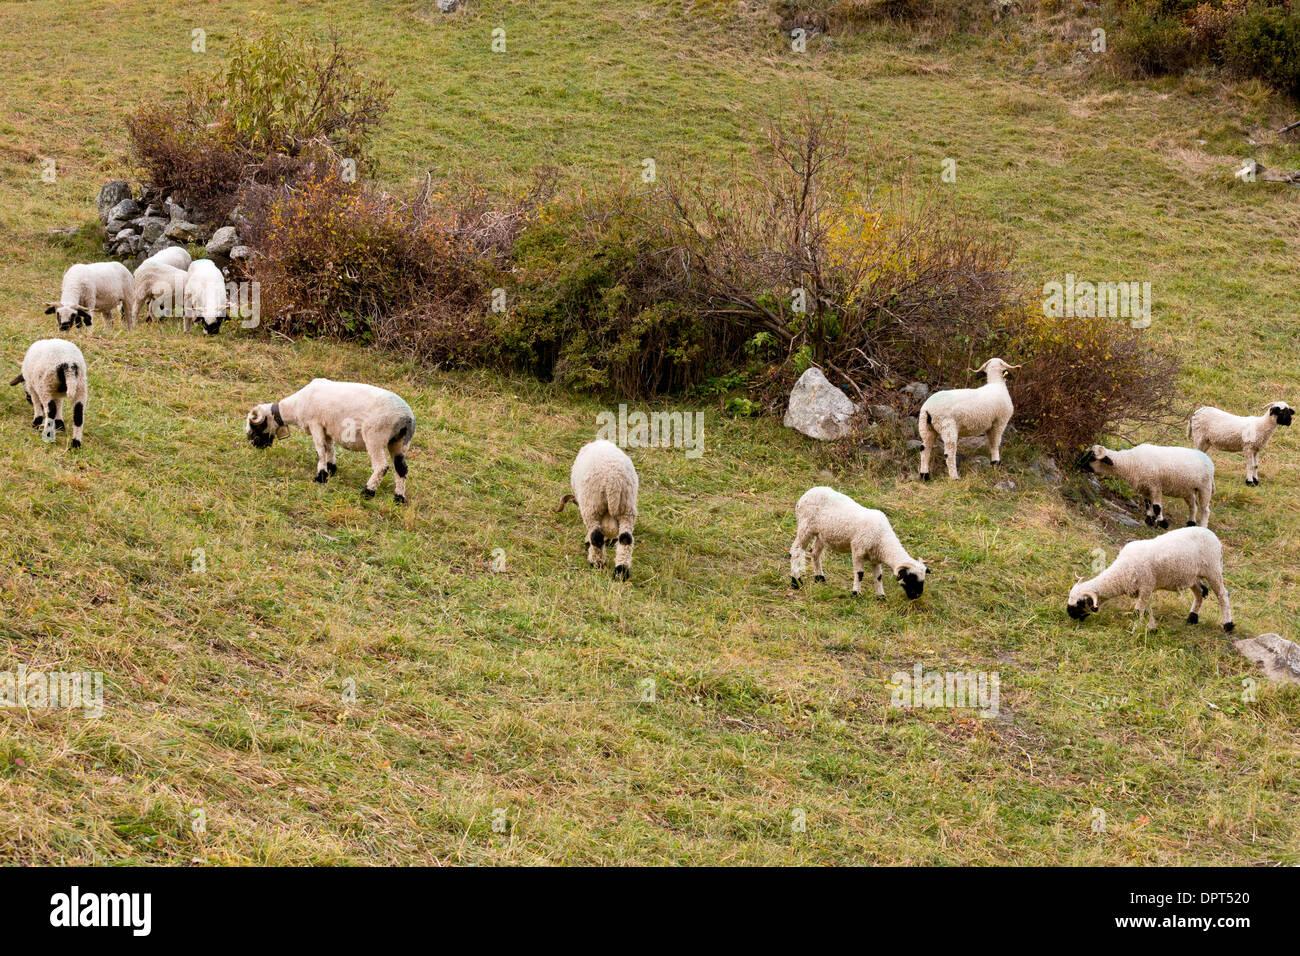 Swiss Valais Blacknose Sheep Breed Stock Photos & Swiss Valais